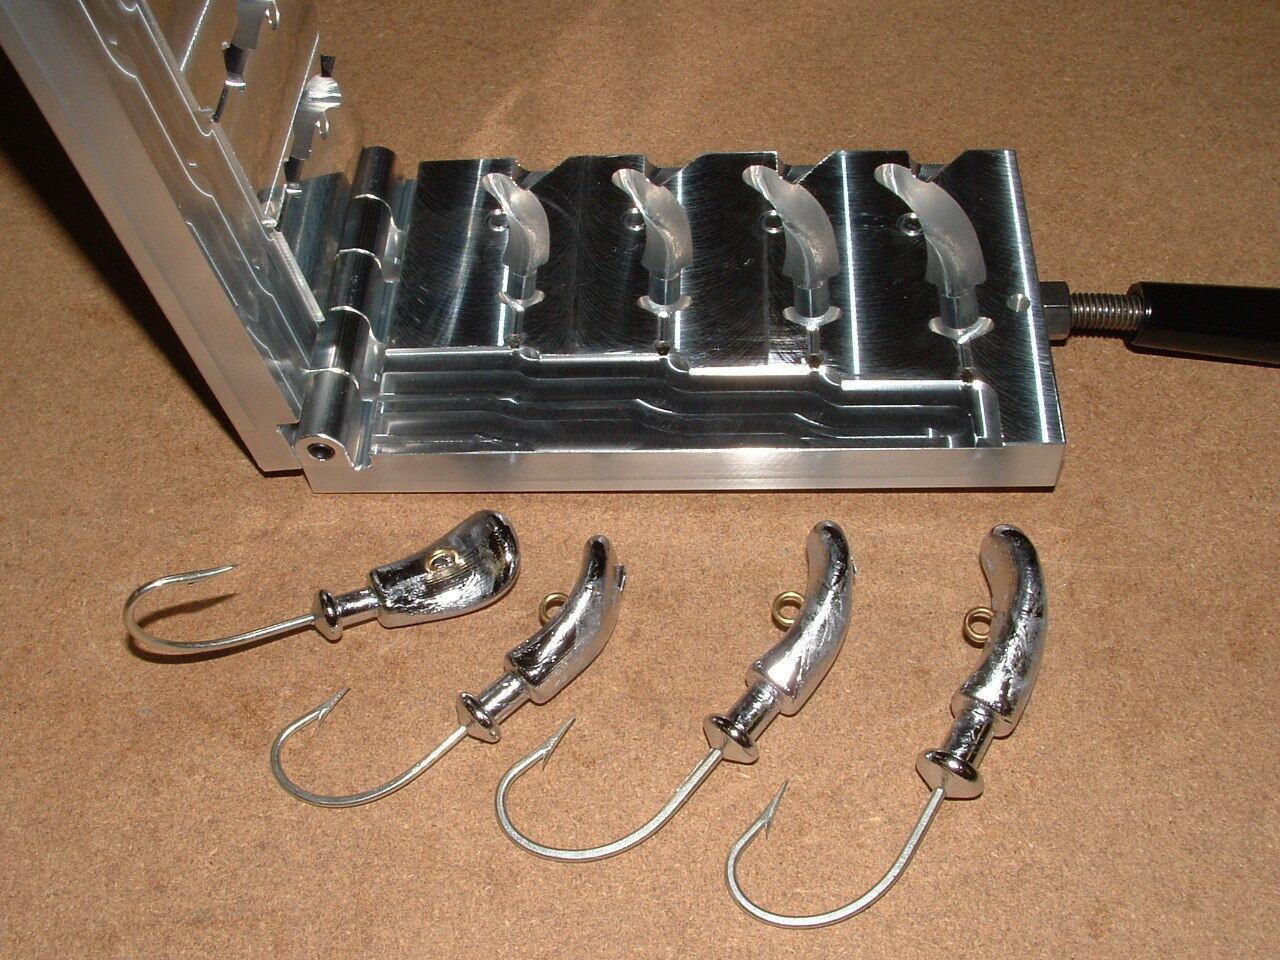 Saltwater Boxer Jig -4 mold 2,2.5,3,4,5oz CNC Aluminum